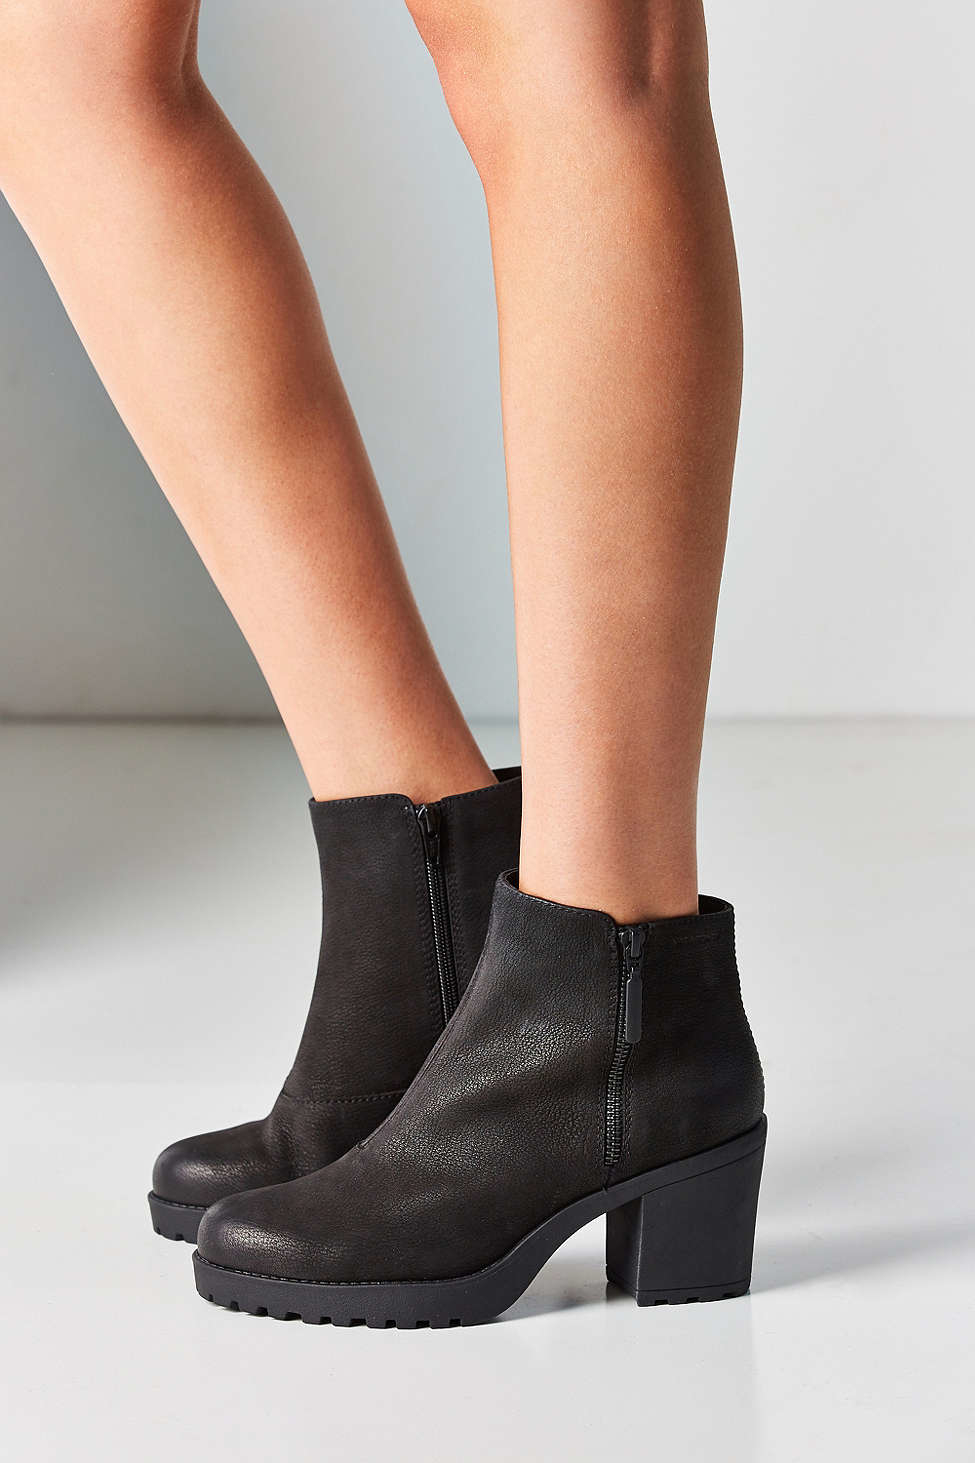 2269817202a6 Vagabond Nubuck Grace Double Zip Ankle Boot in Black - Lyst